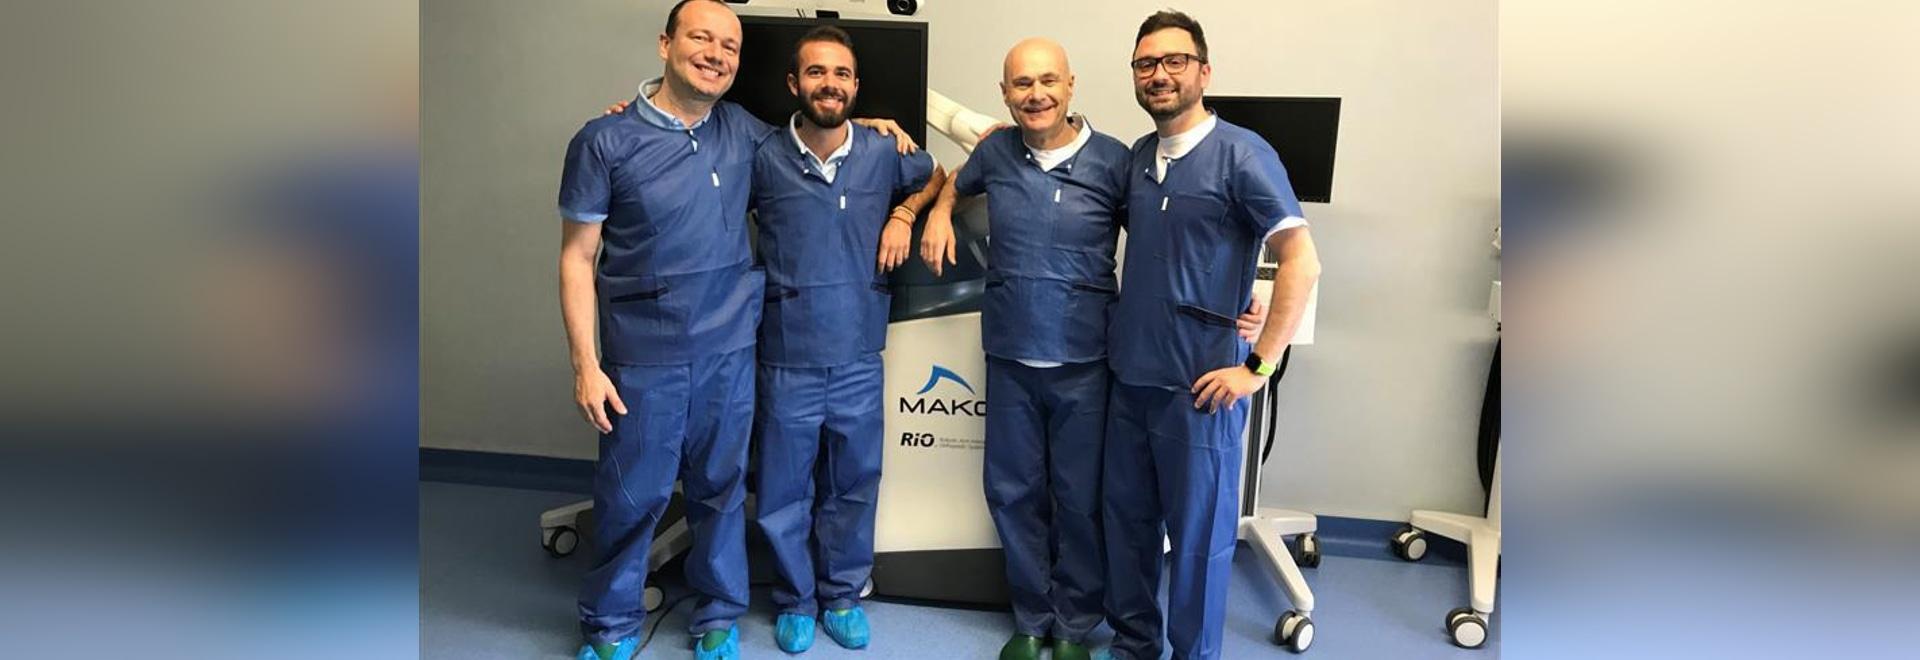 hunova and rehabilitation following robotic knee arthroplasty